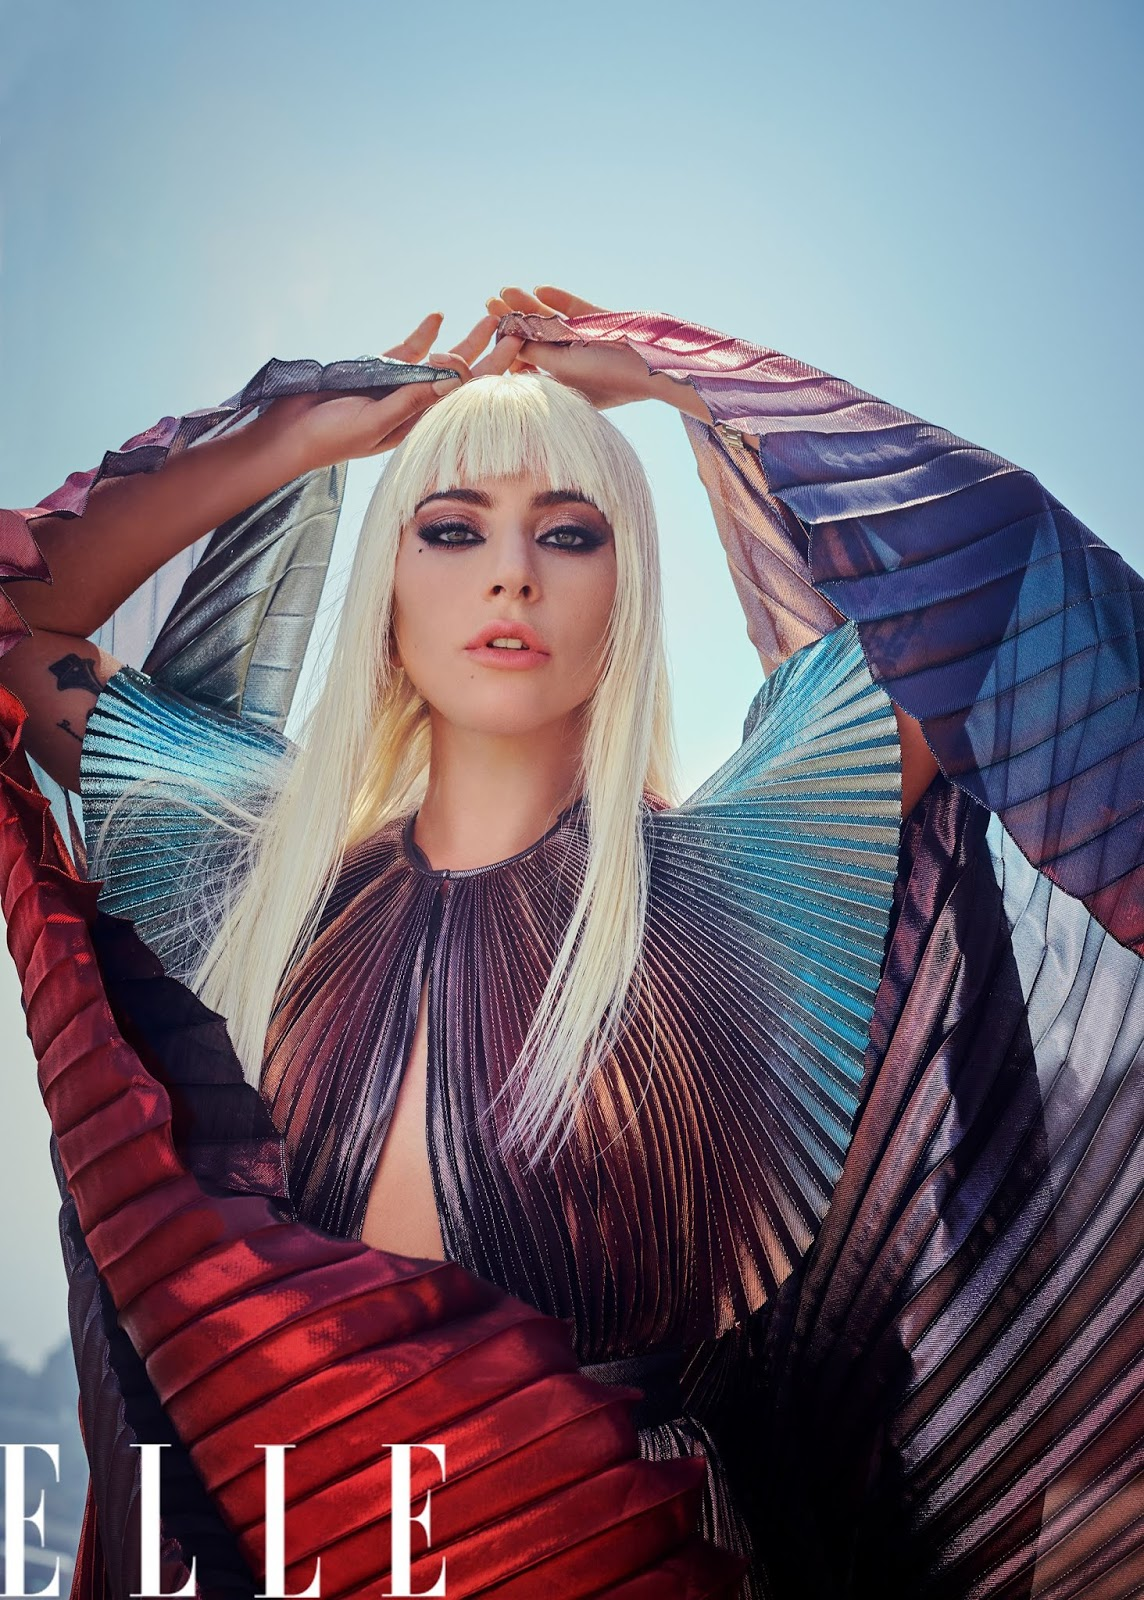 FOTOS HQ: Photoshoot de Lady Gaga para Elle Magazine, por ...